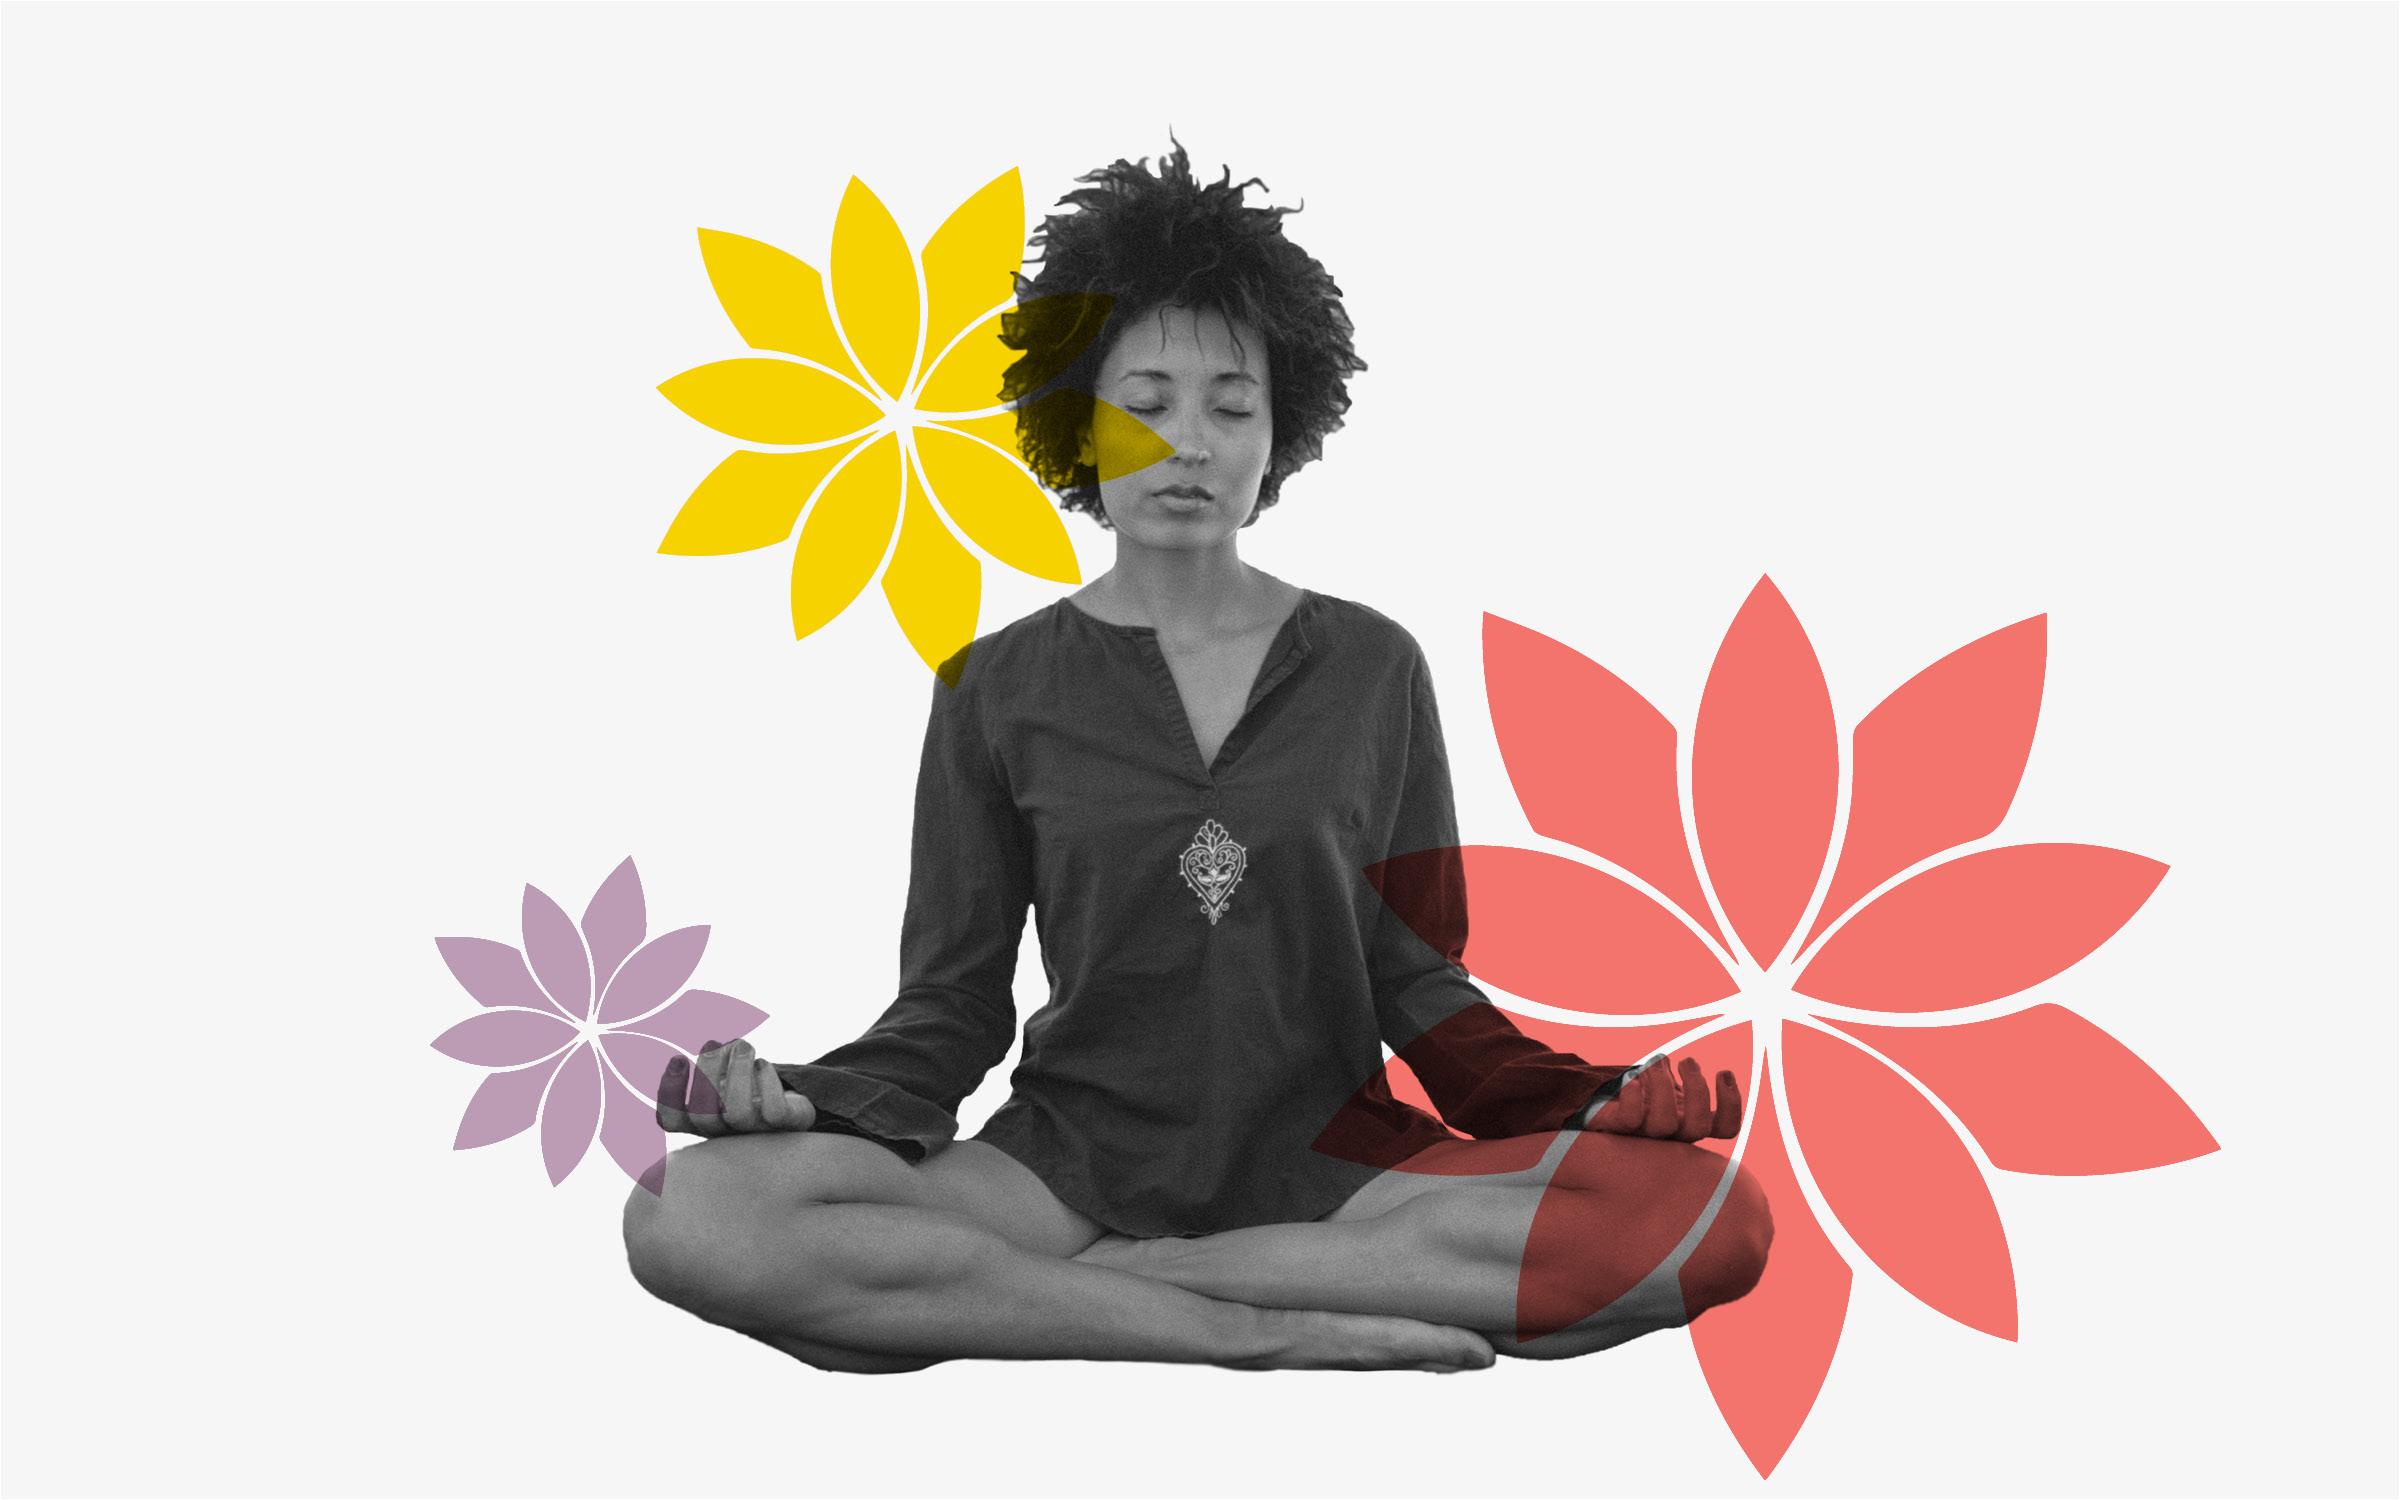 Post-Work Day Mindful Meditation